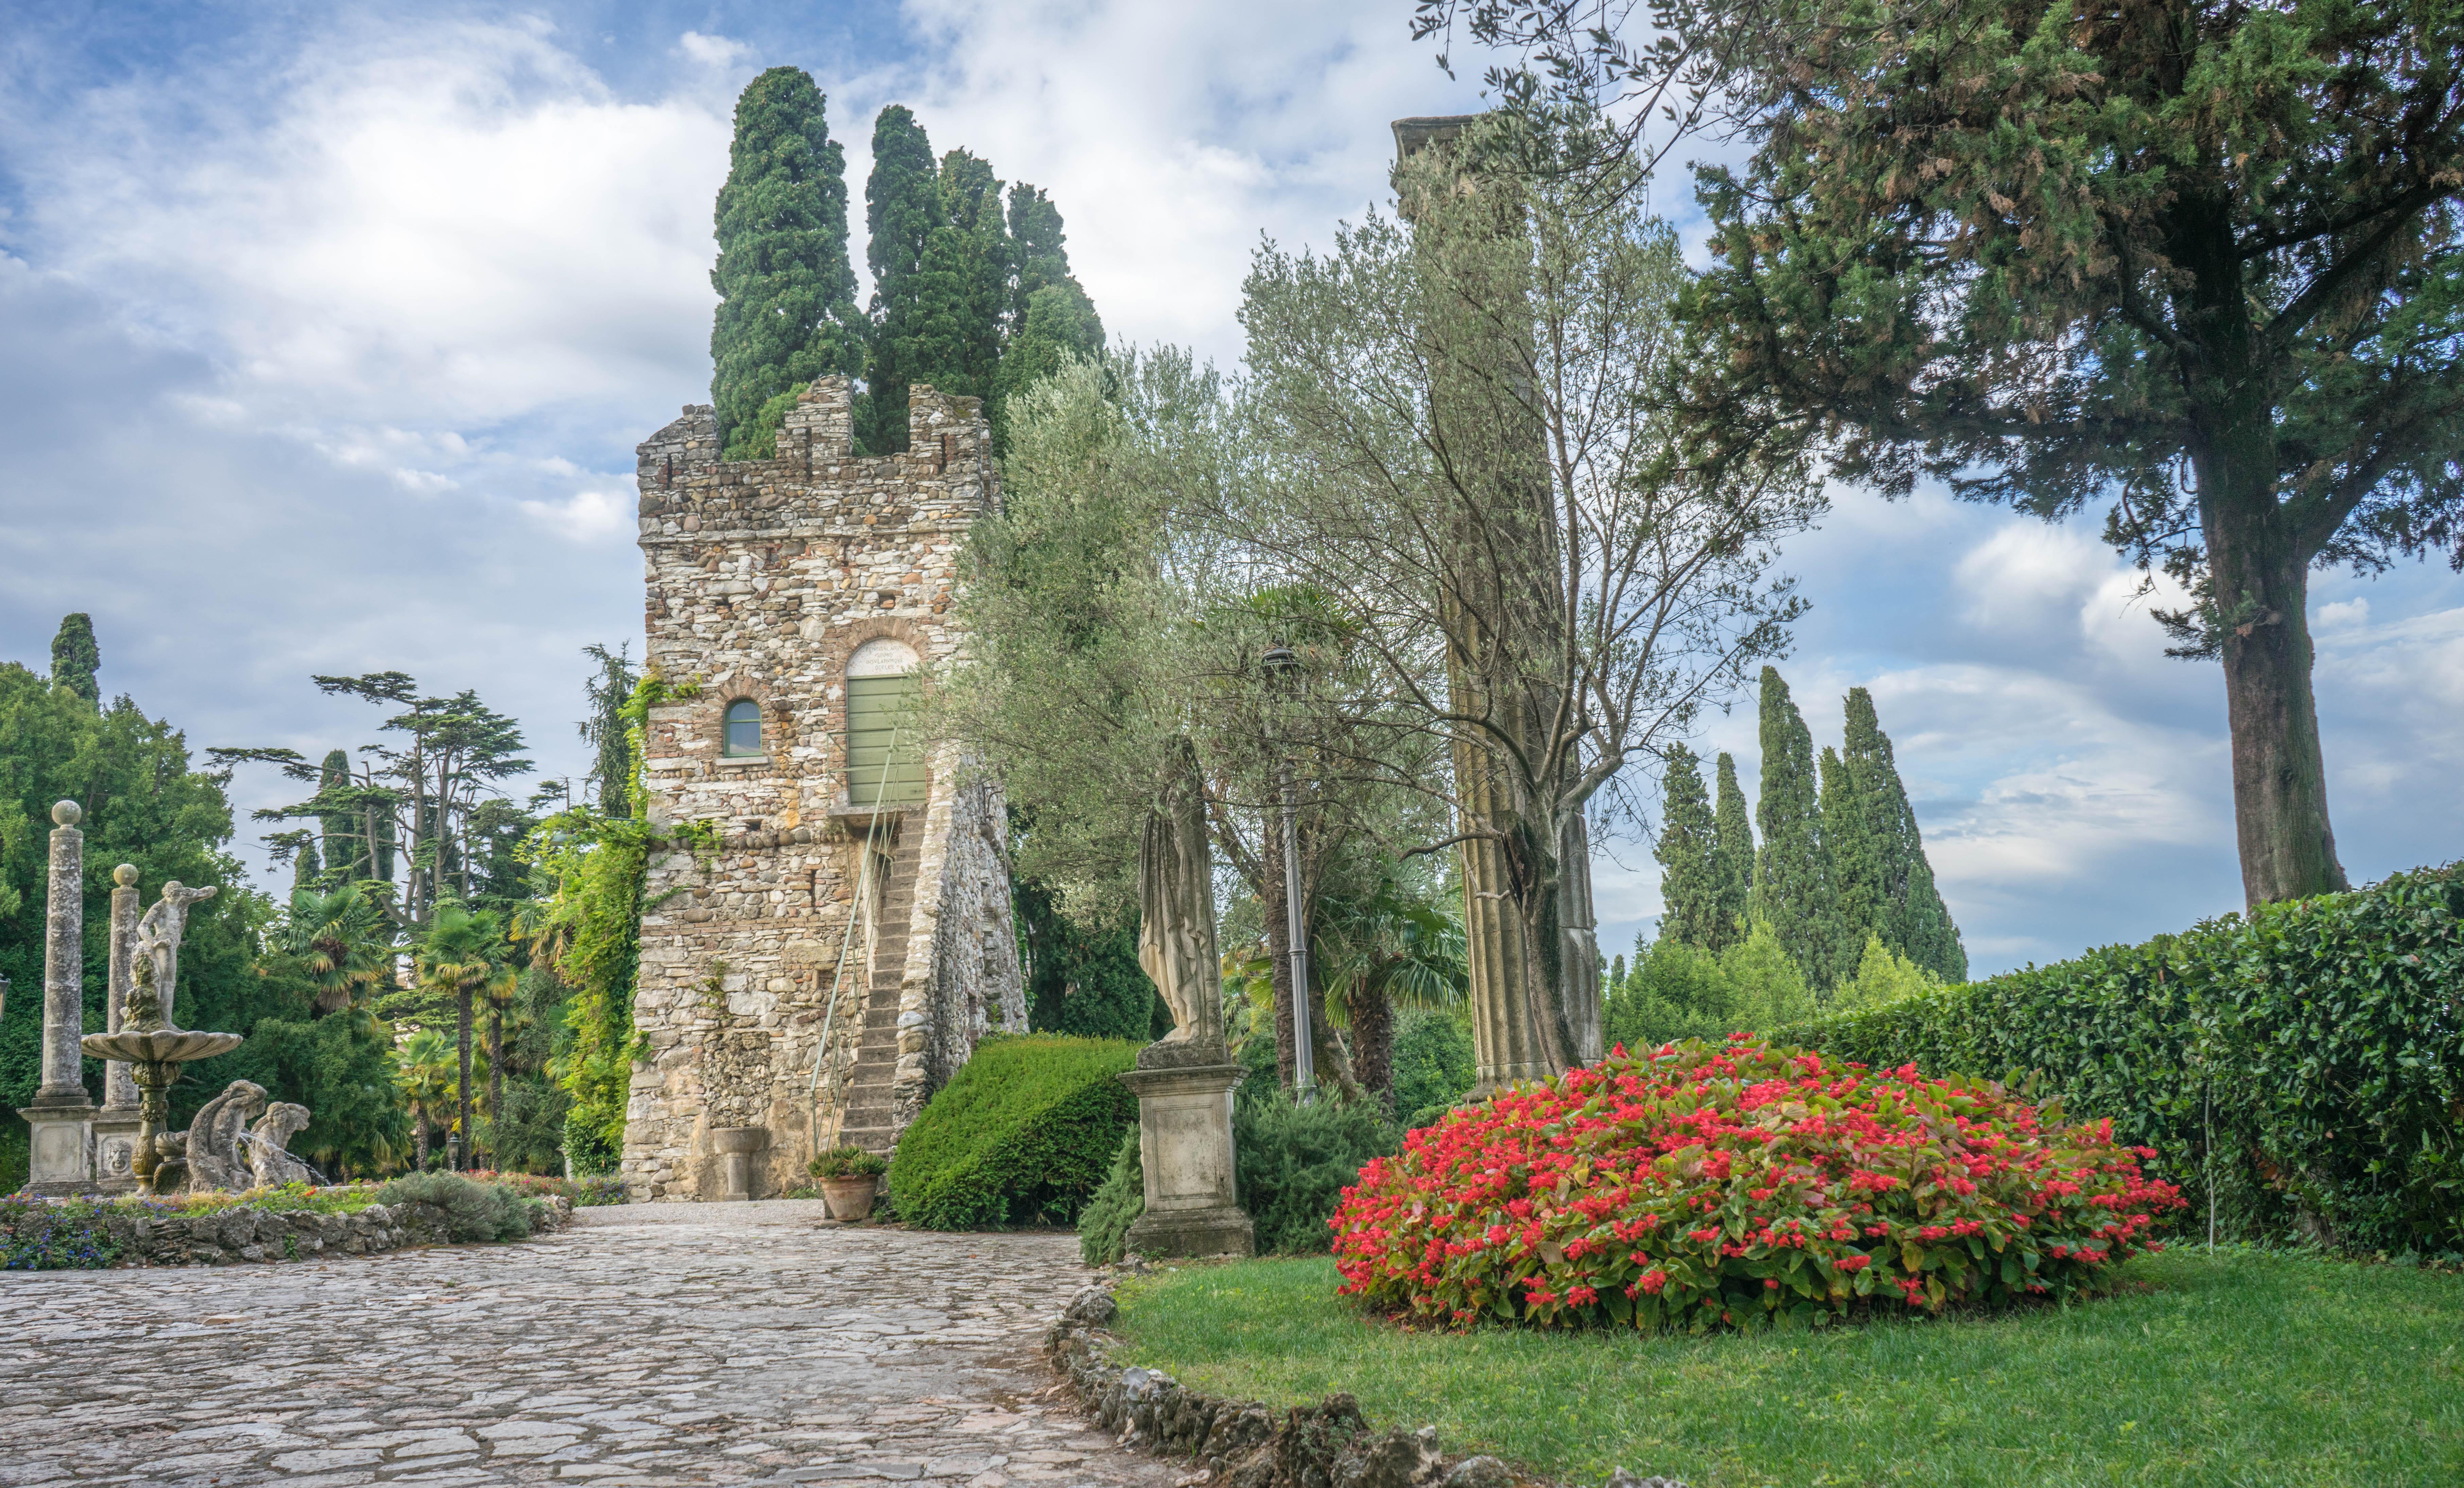 Fotos gratis rbol al aire libre arquitectura flor for Jardines italianos